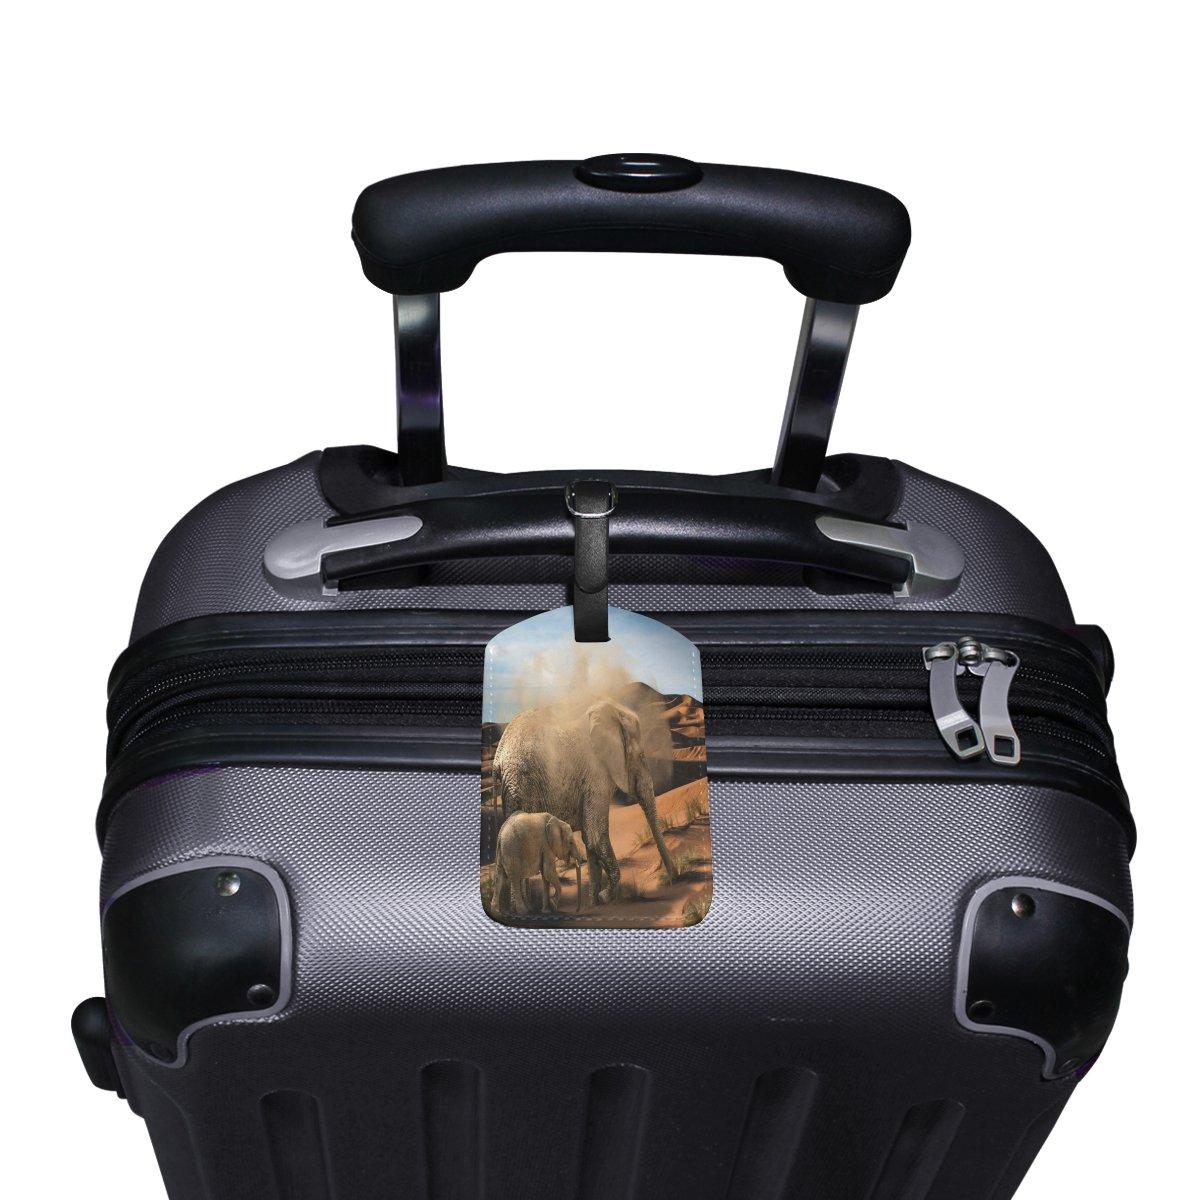 1Pcs Saobao Travel Luggage Tag Lucky Elephant PU Leather Baggage Suitcase Travel ID Bag Tag